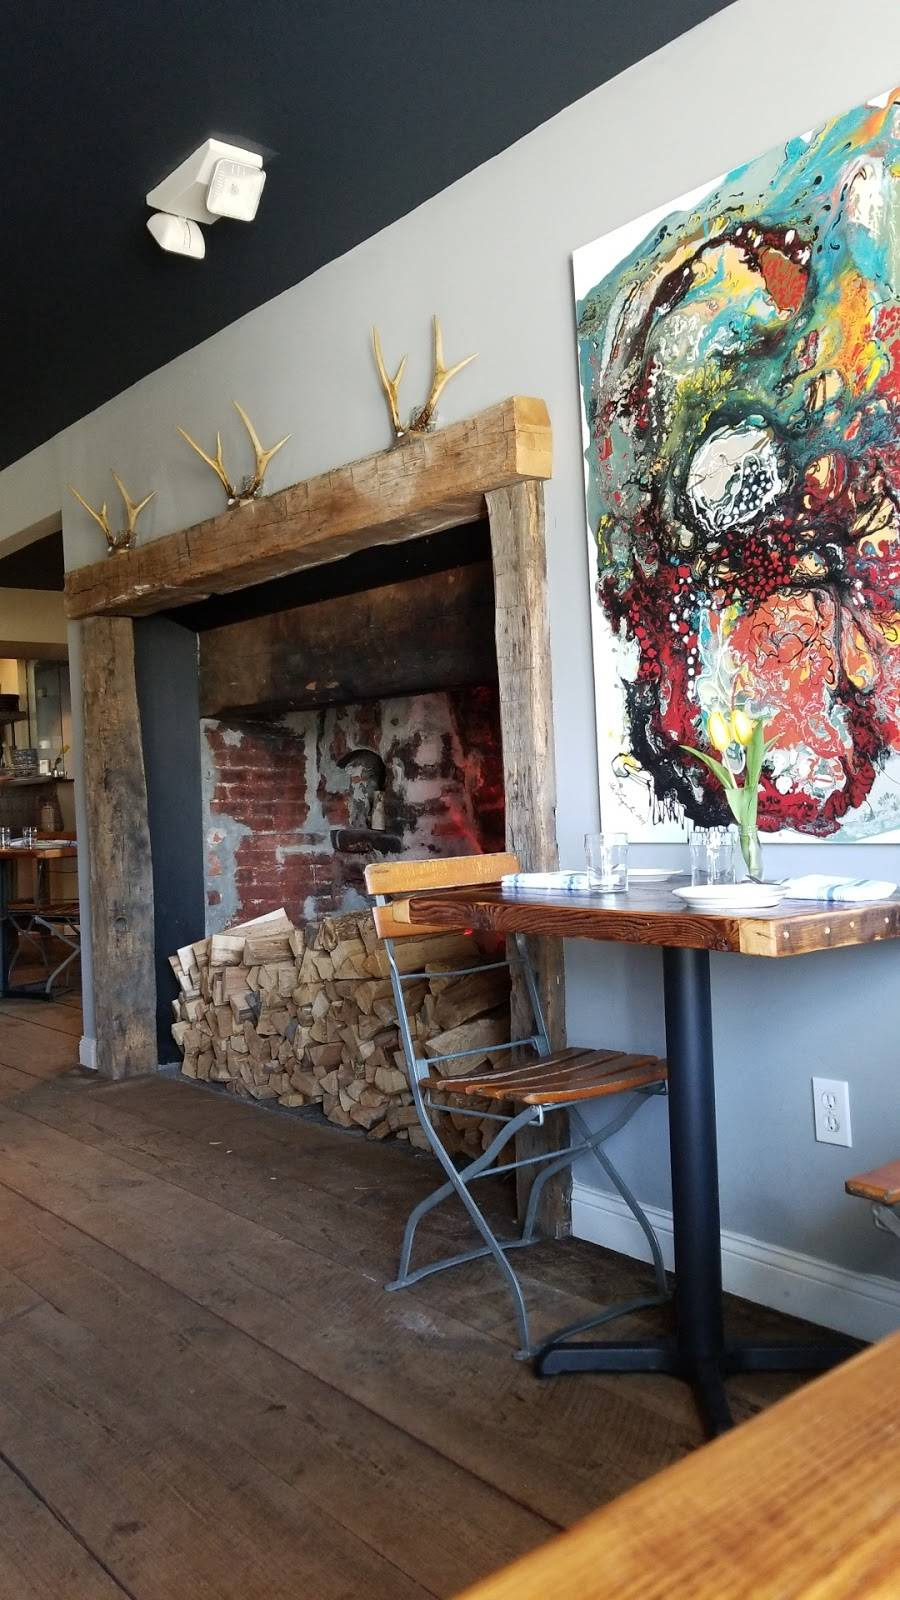 Lucas Local Oyster Bar   restaurant   48 S Main St, Newtown, CT 06470, USA   2034912992 OR +1 203-491-2992